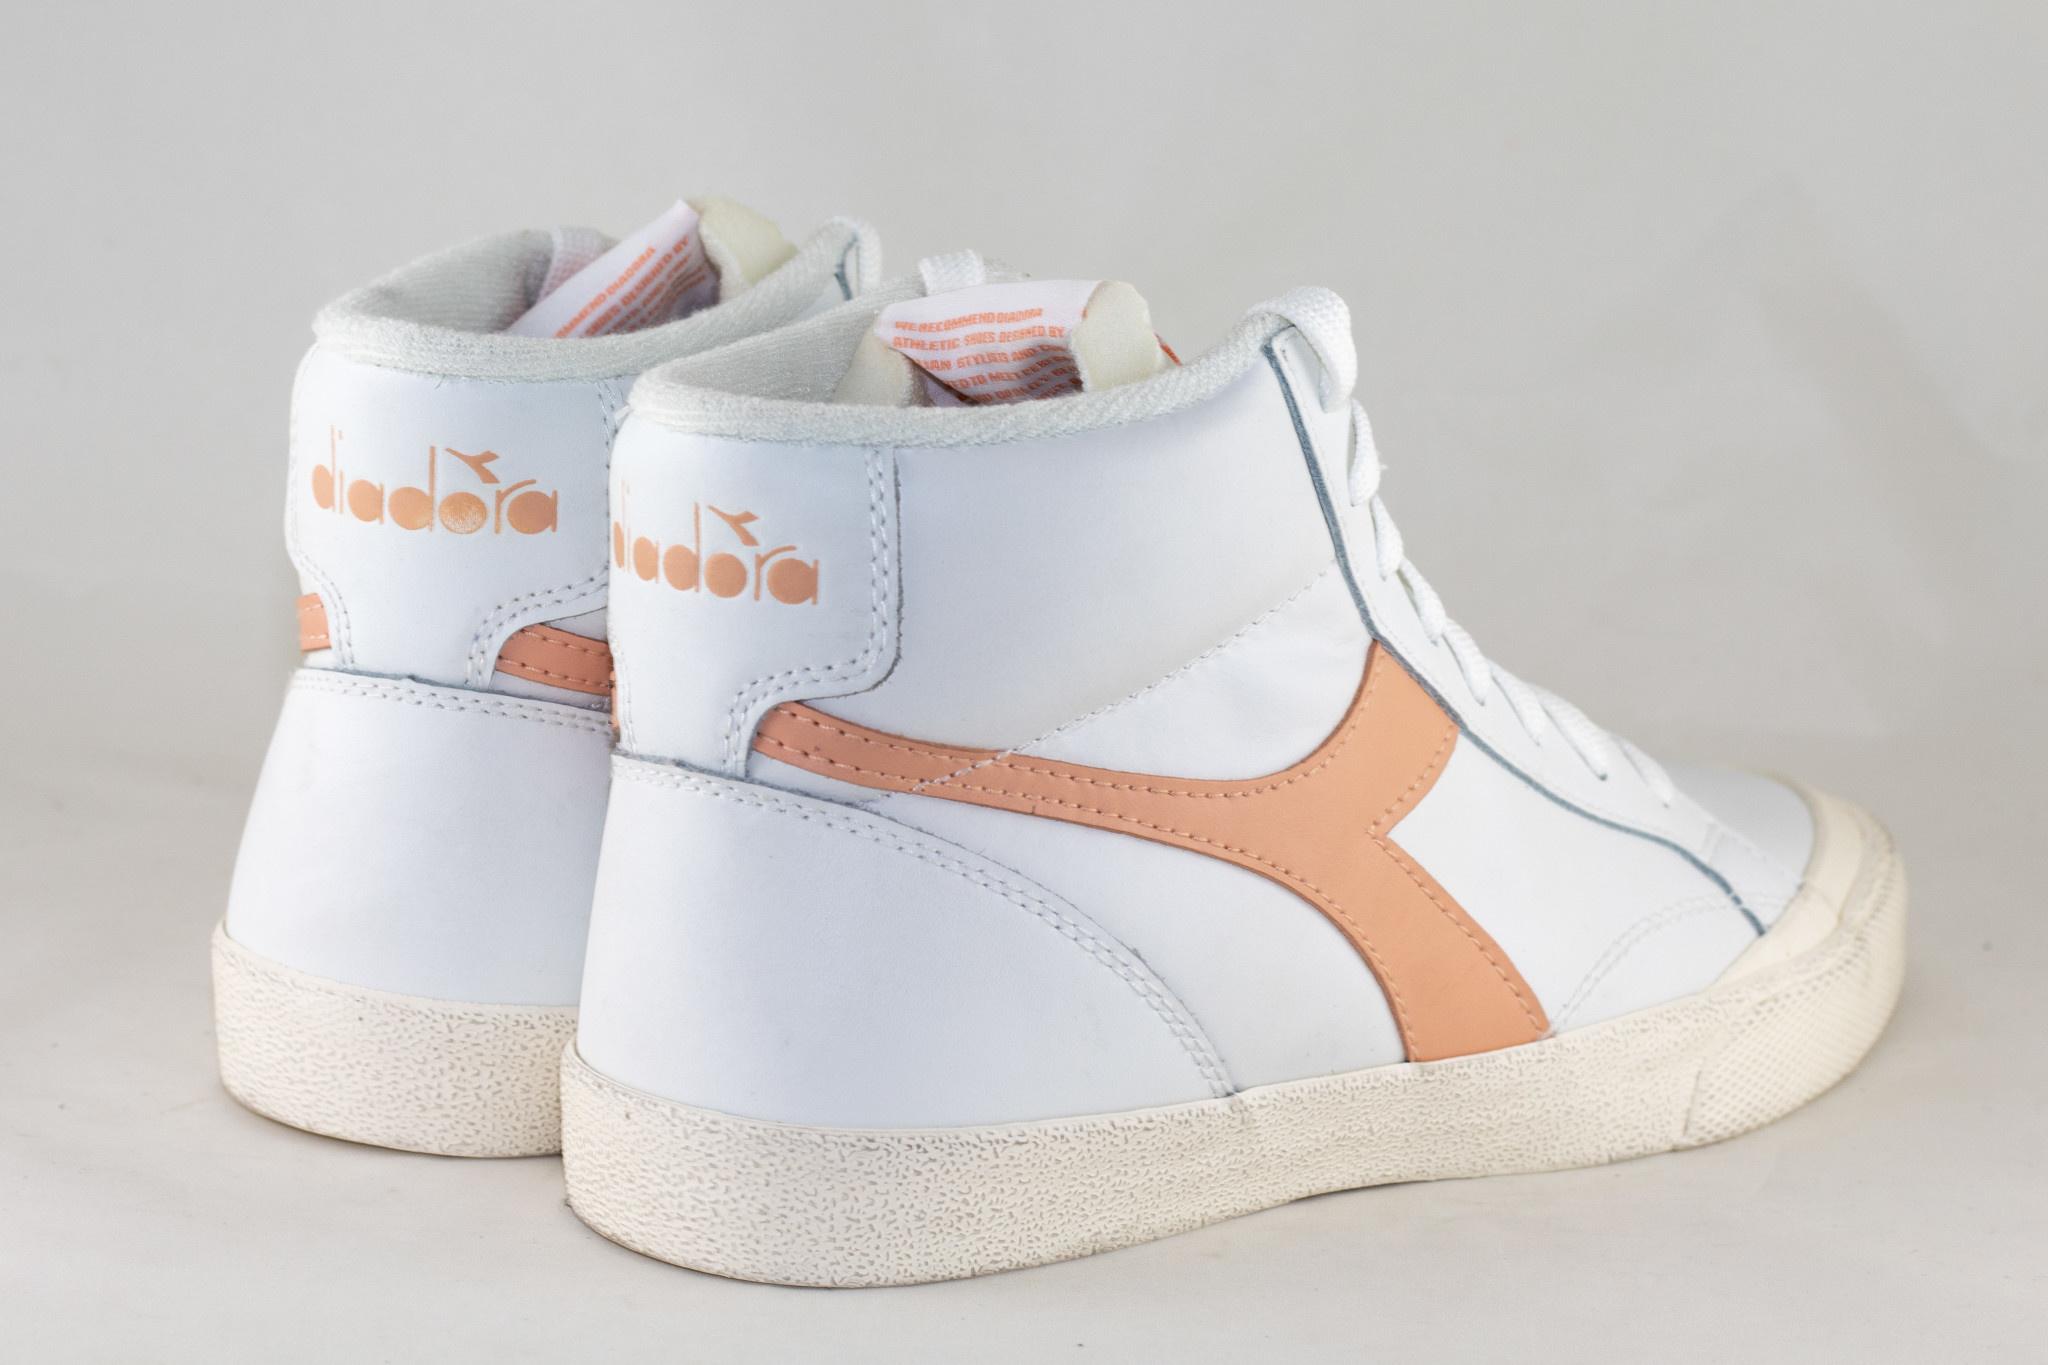 DIADORA MELODY MID LEATHER DIRTY White/ Peach Parfait